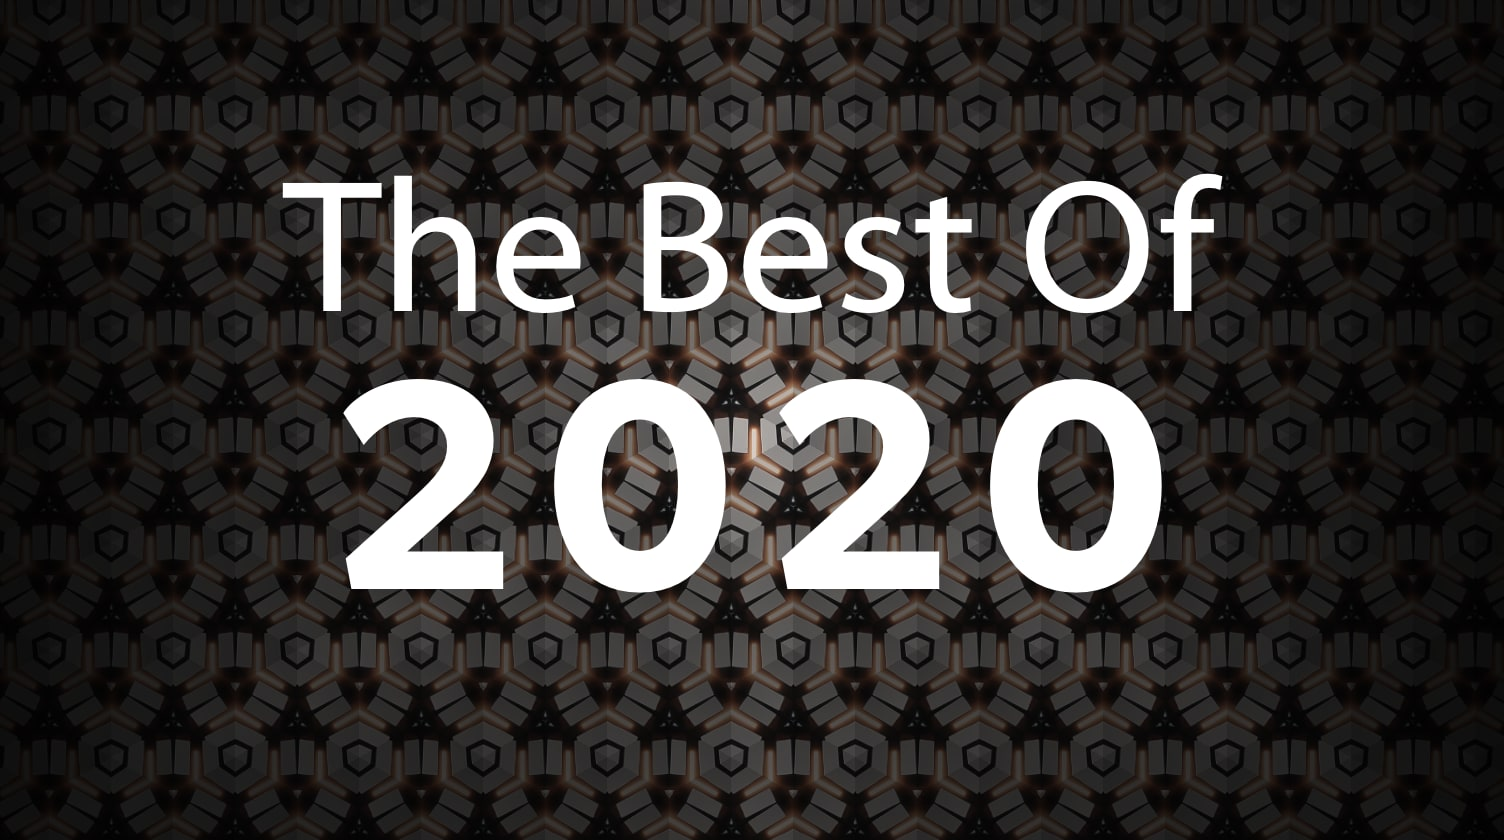 Trevor Graham's Top Albums of 2020